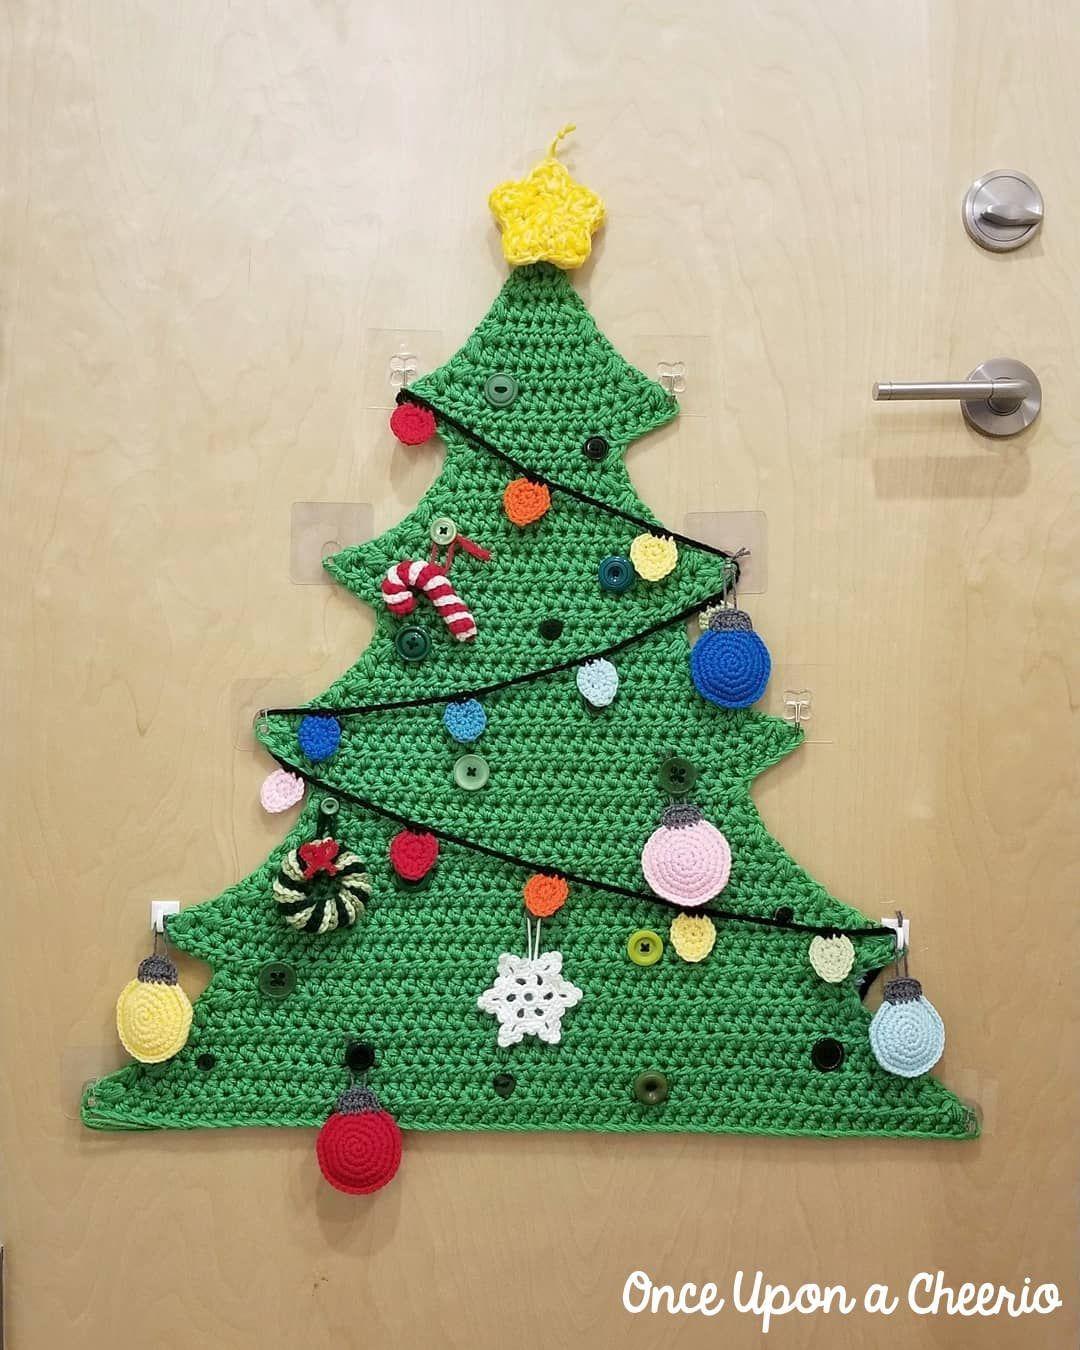 O Crochet Christmas Tree 2018 Amigurumi Christmas Lights Tree Christmas Crochet Patterns Christmas Tree Decorations Diy Ornaments Christmas Crochet